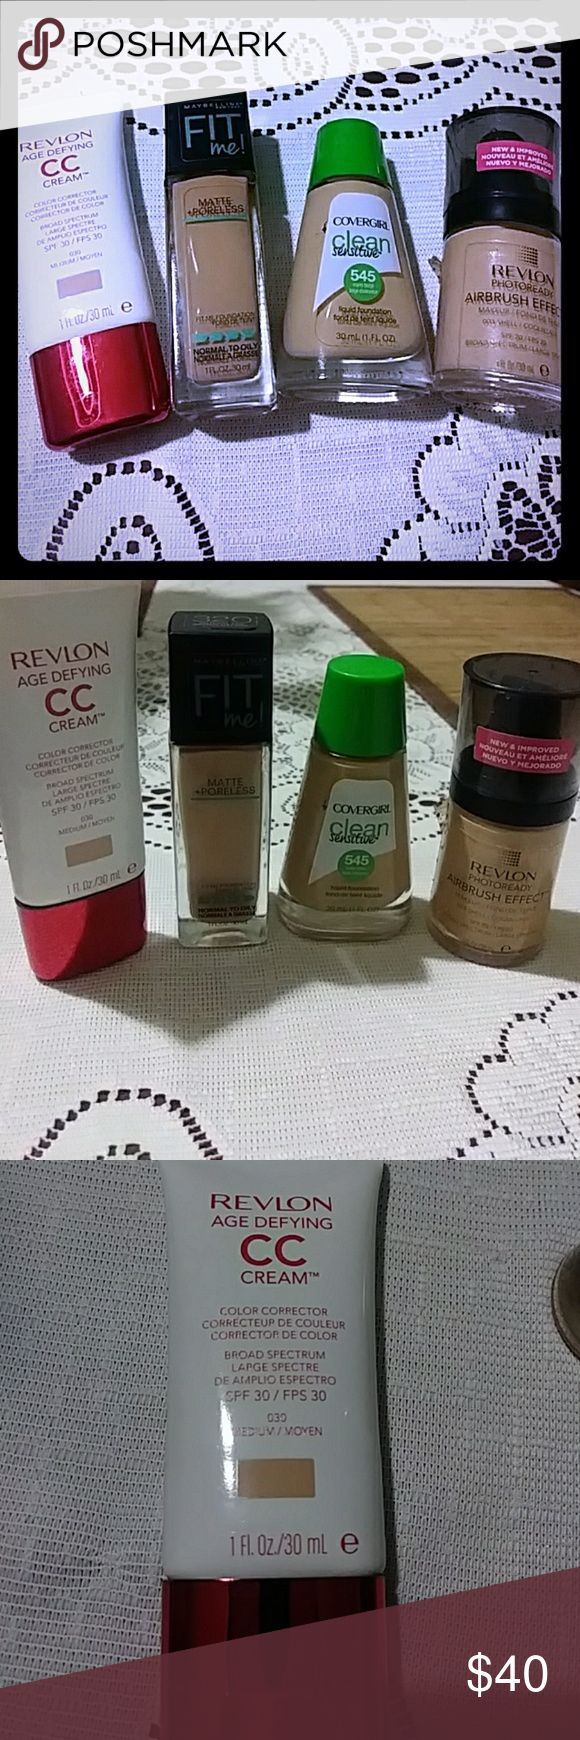 4 Sets of Foundation Bundle Revlon Age Defying CC Cream